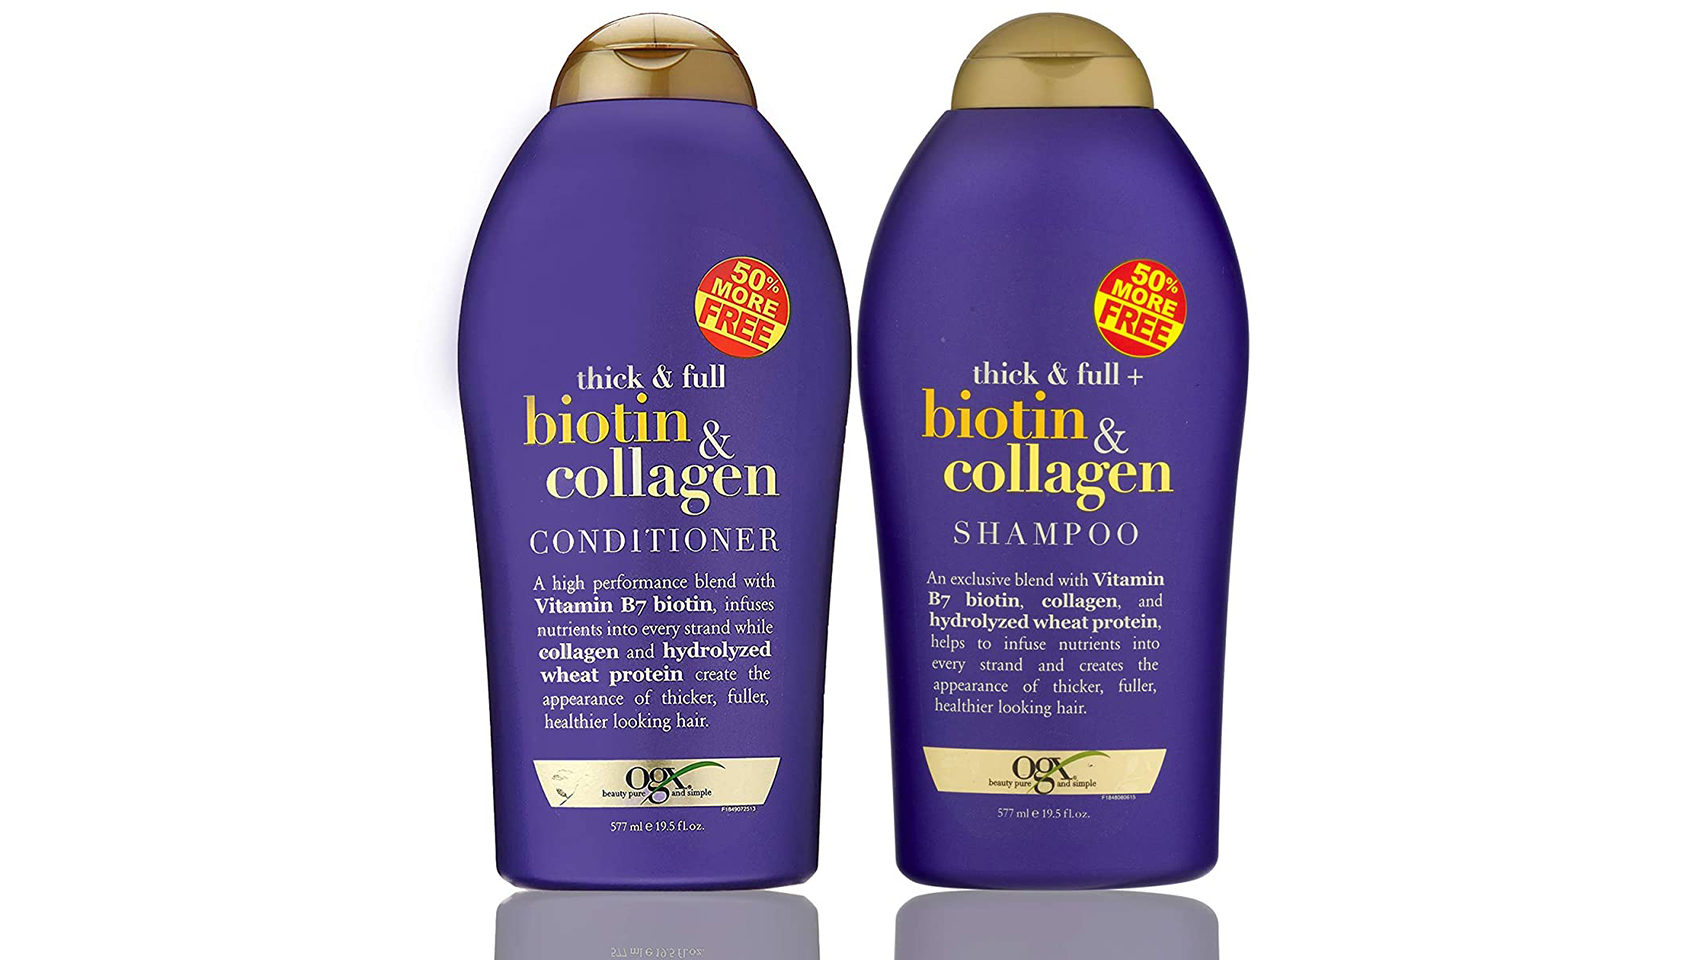 OGX biotin and collagen shampoo and conditioner